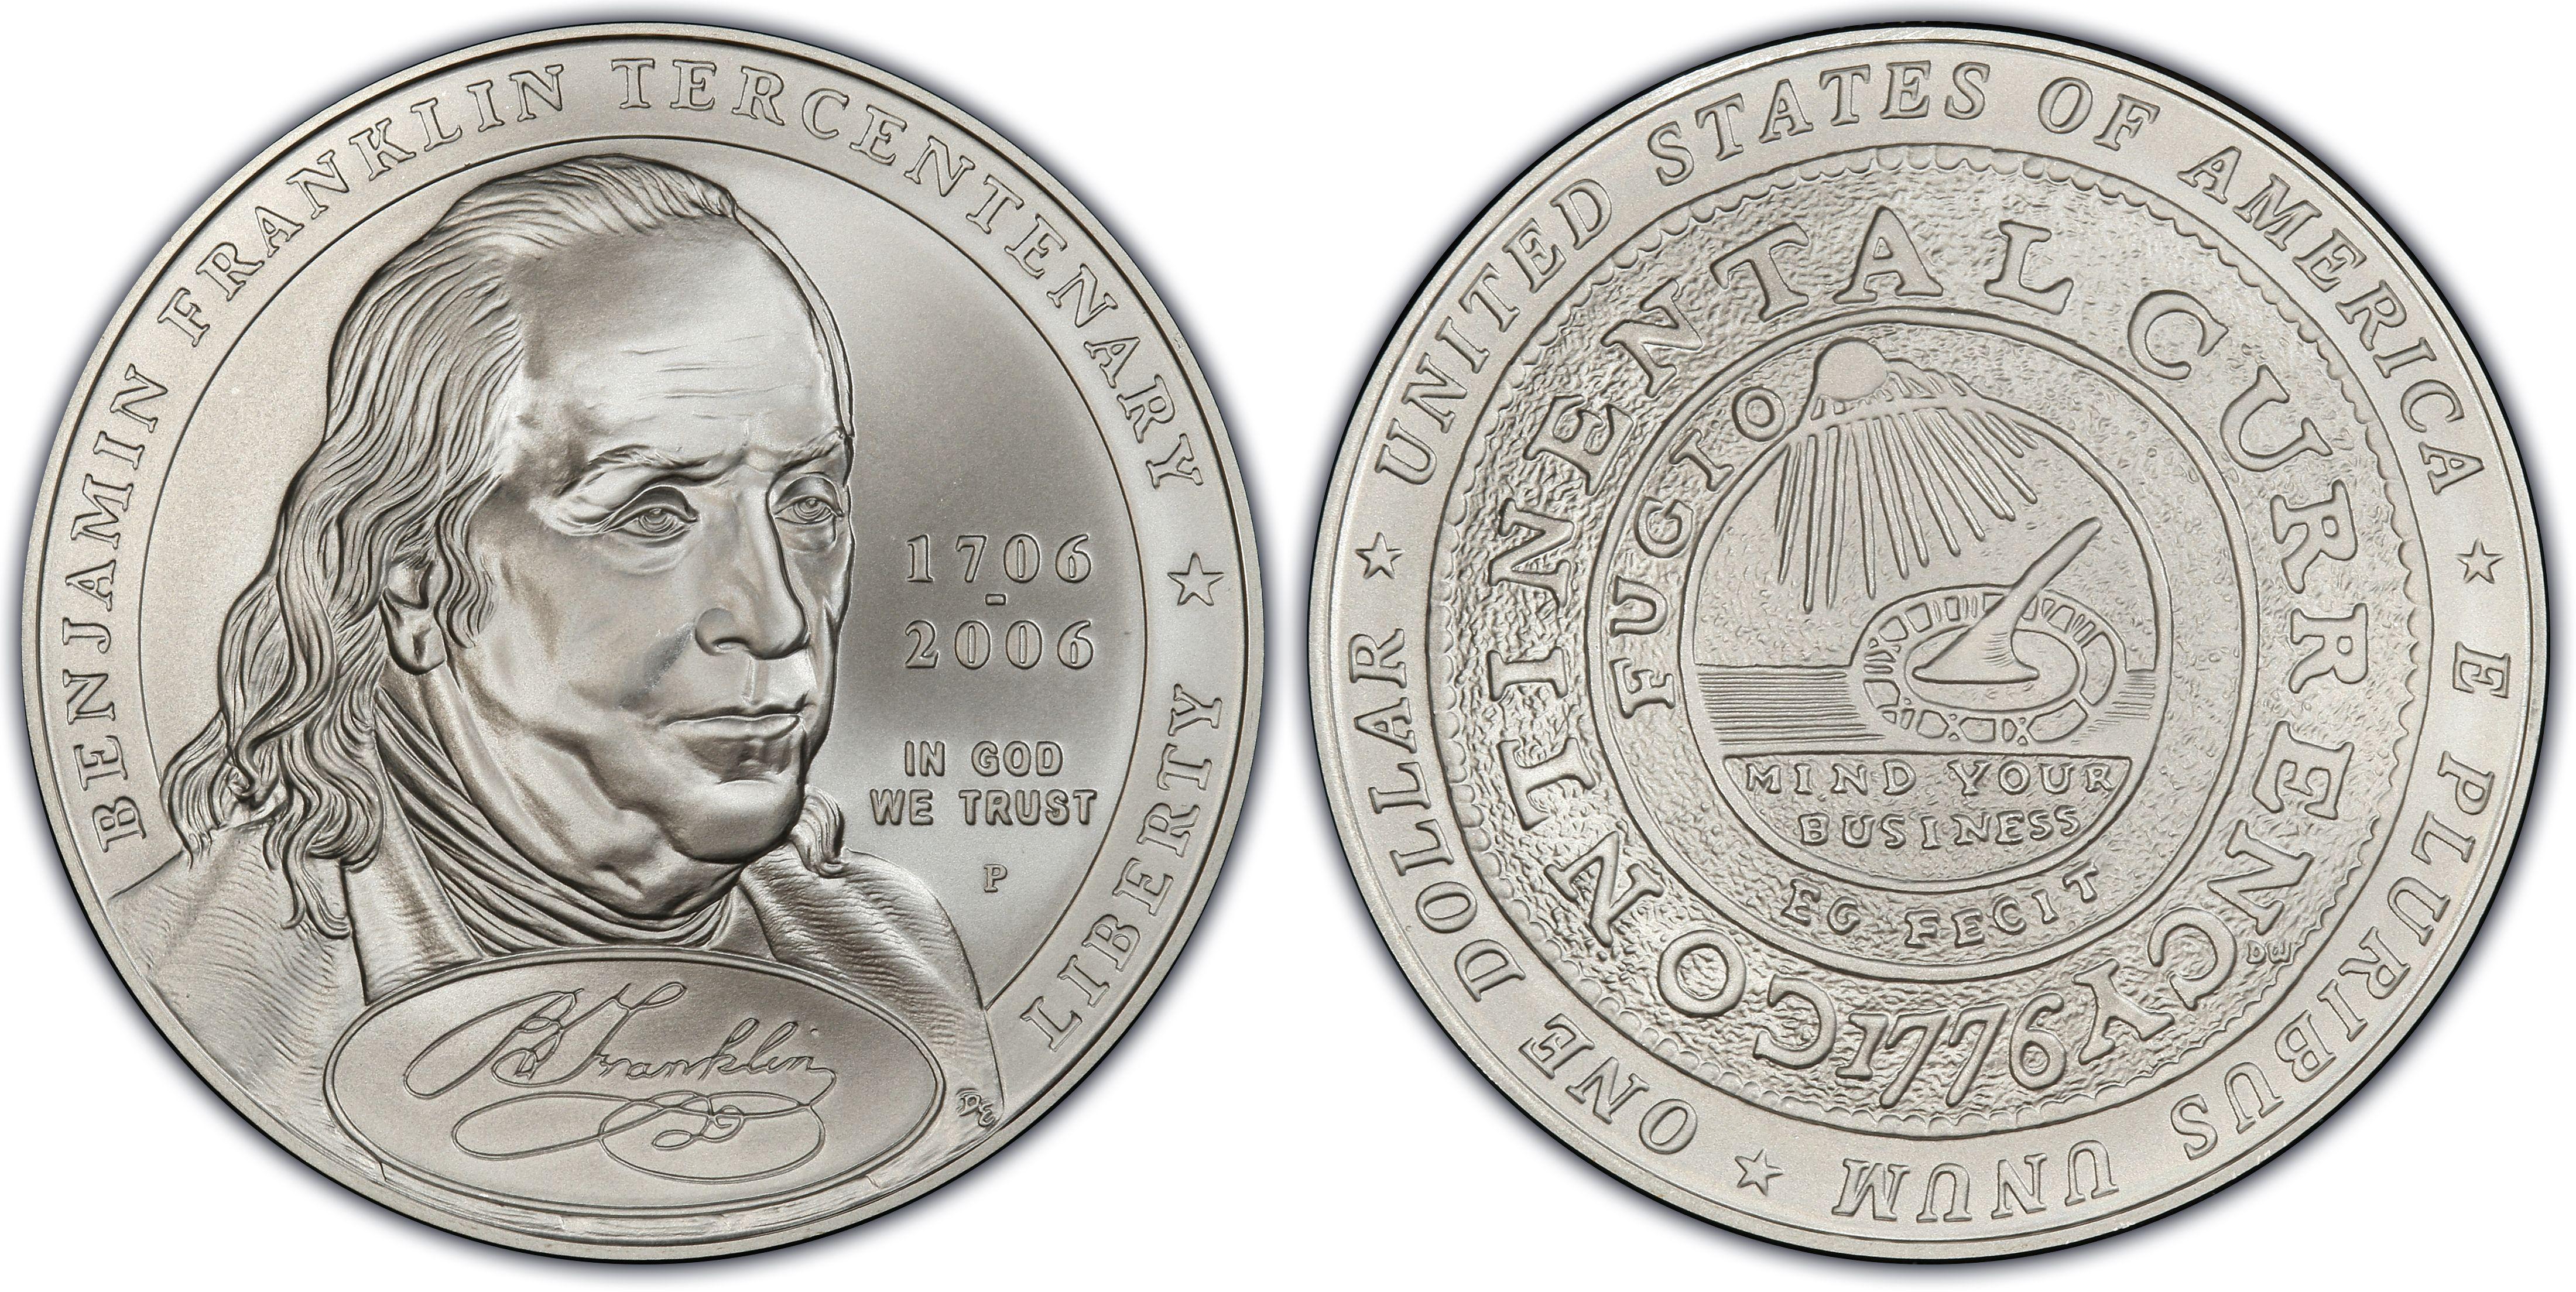 Benjamin Franklin Founding Father 2006 Proof Silver dollar 1 oz BN3 2006 w//COA